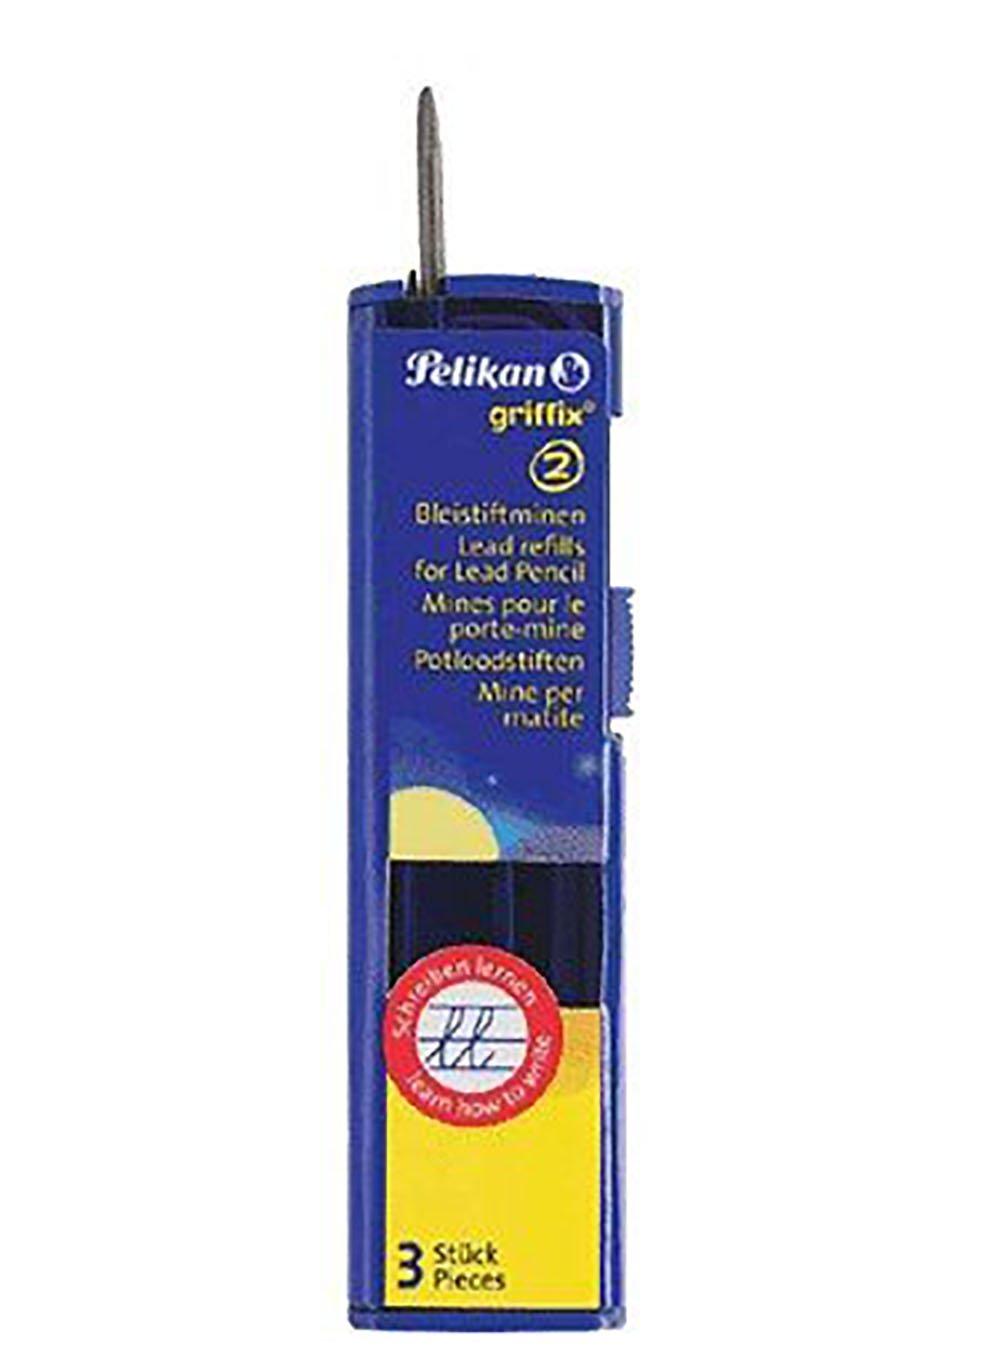 Pelikan Griffix 2mm Lead Refills for Pencil (Pack of 3) PK-960476